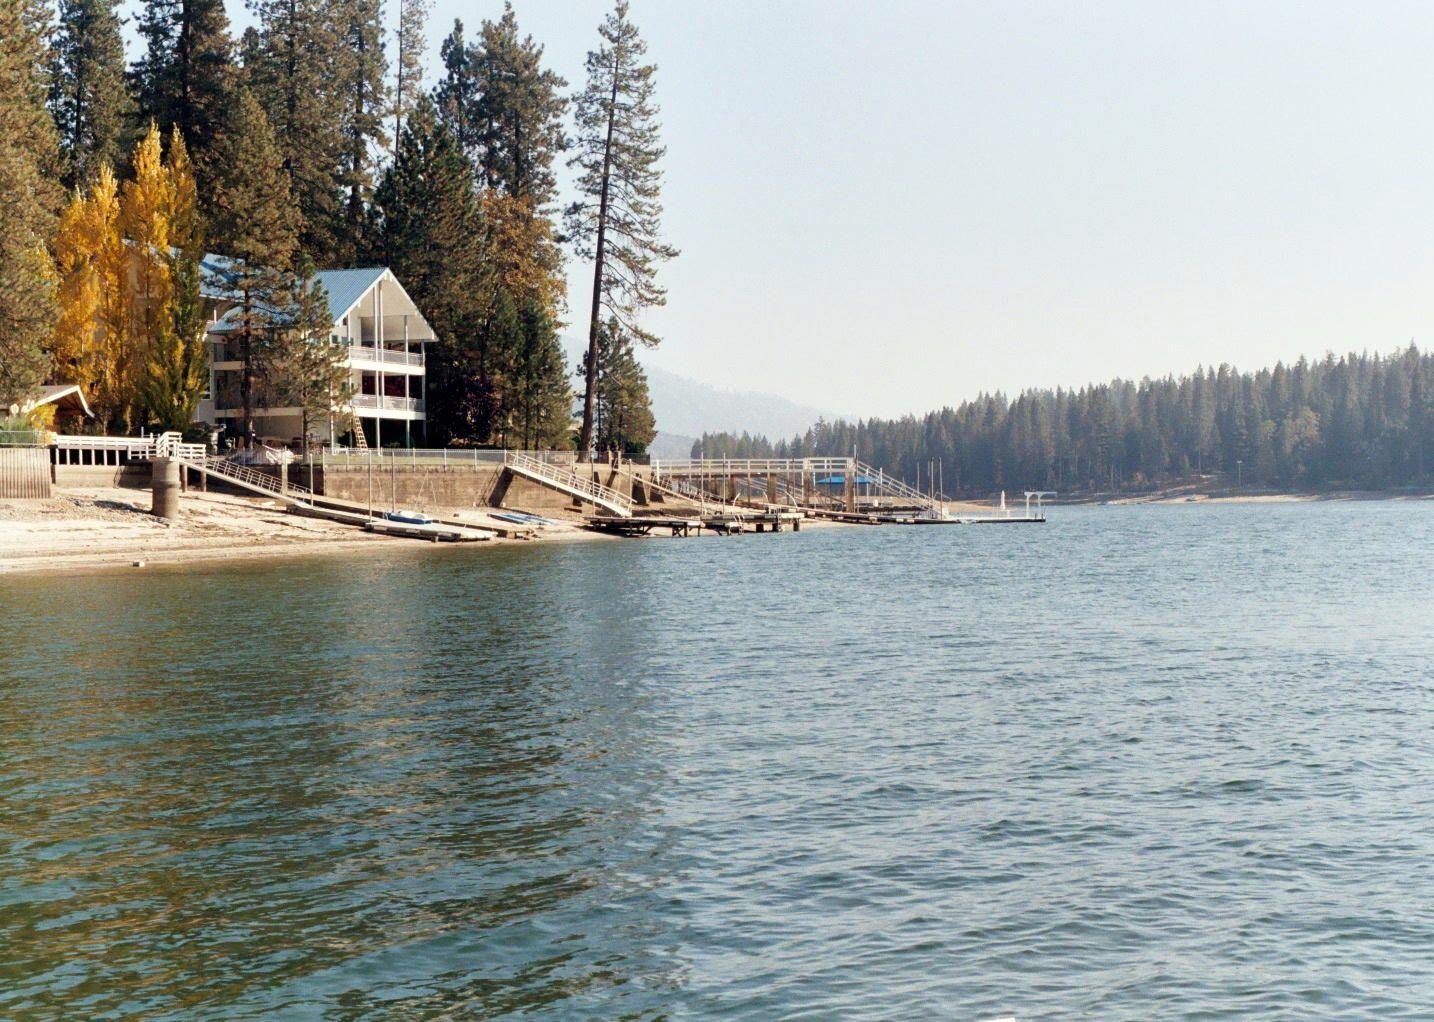 Bass lake ca google image result for httpwww